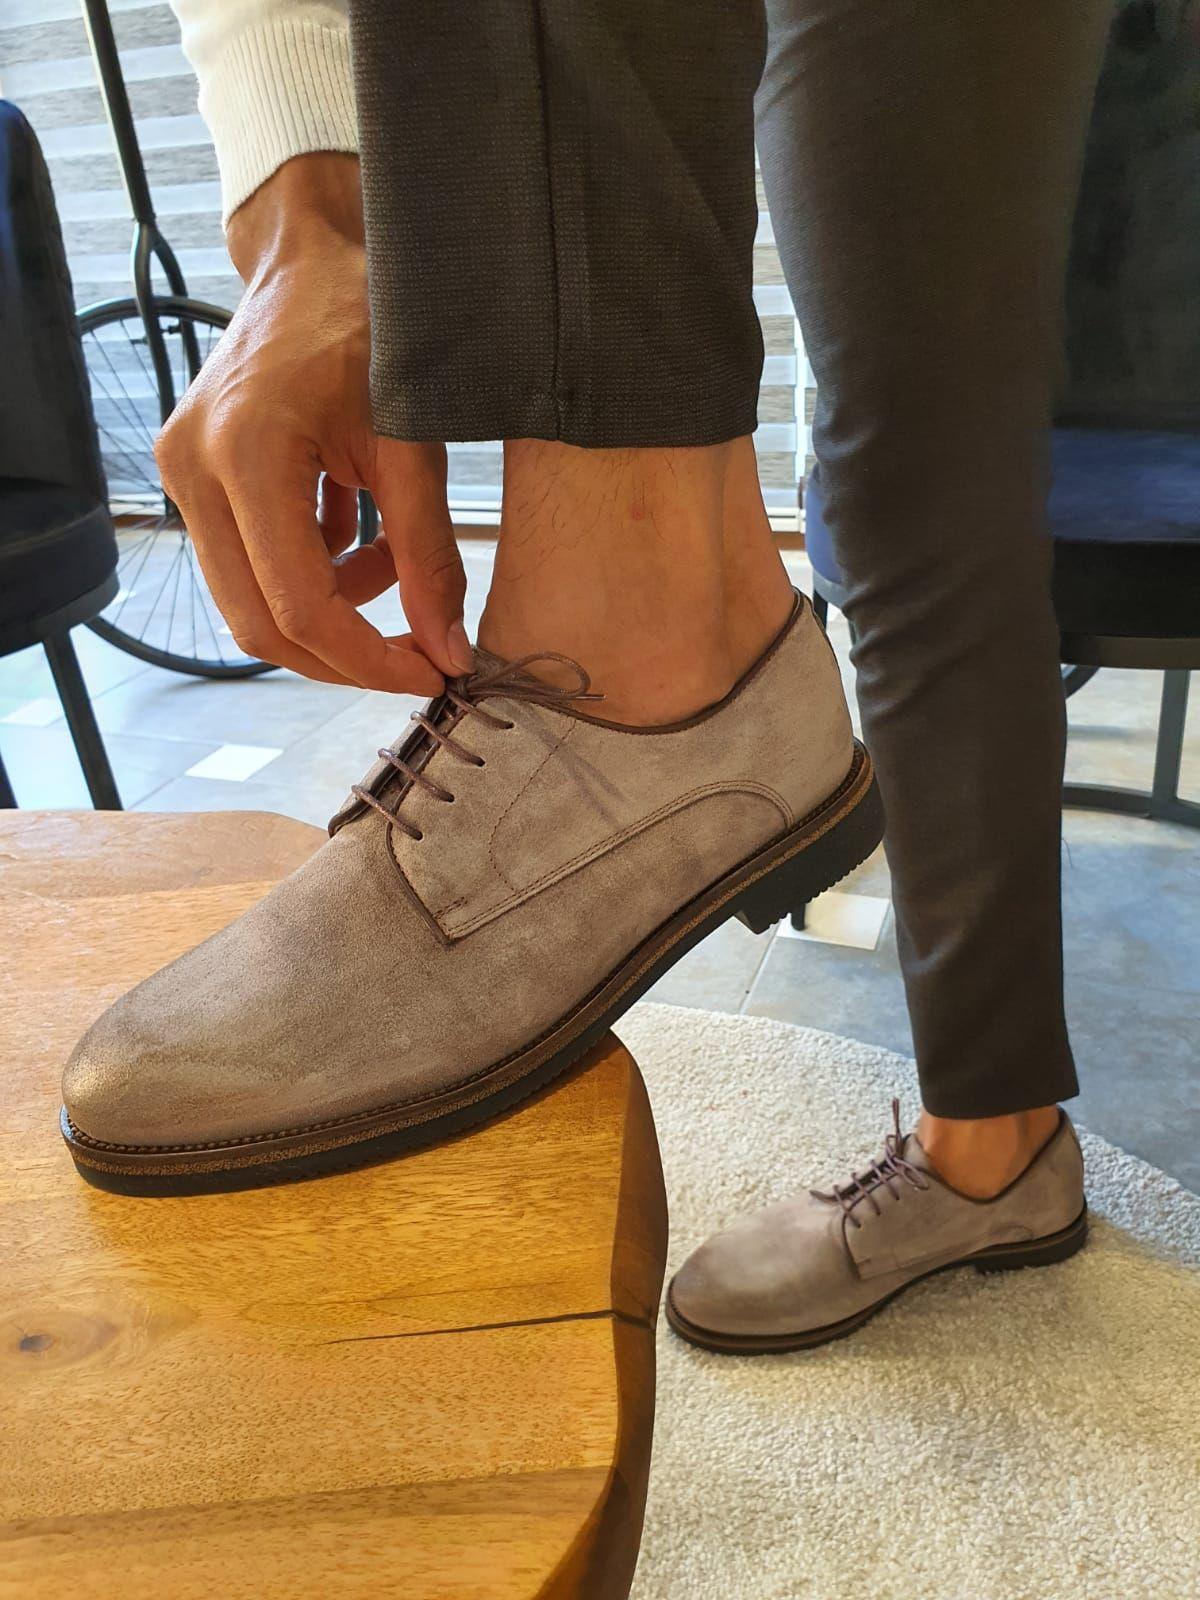 Sardinelli Siena Beige Suede Derbys In 2020 Dress Shoes Men Exclusive Shoes Chukka Boots